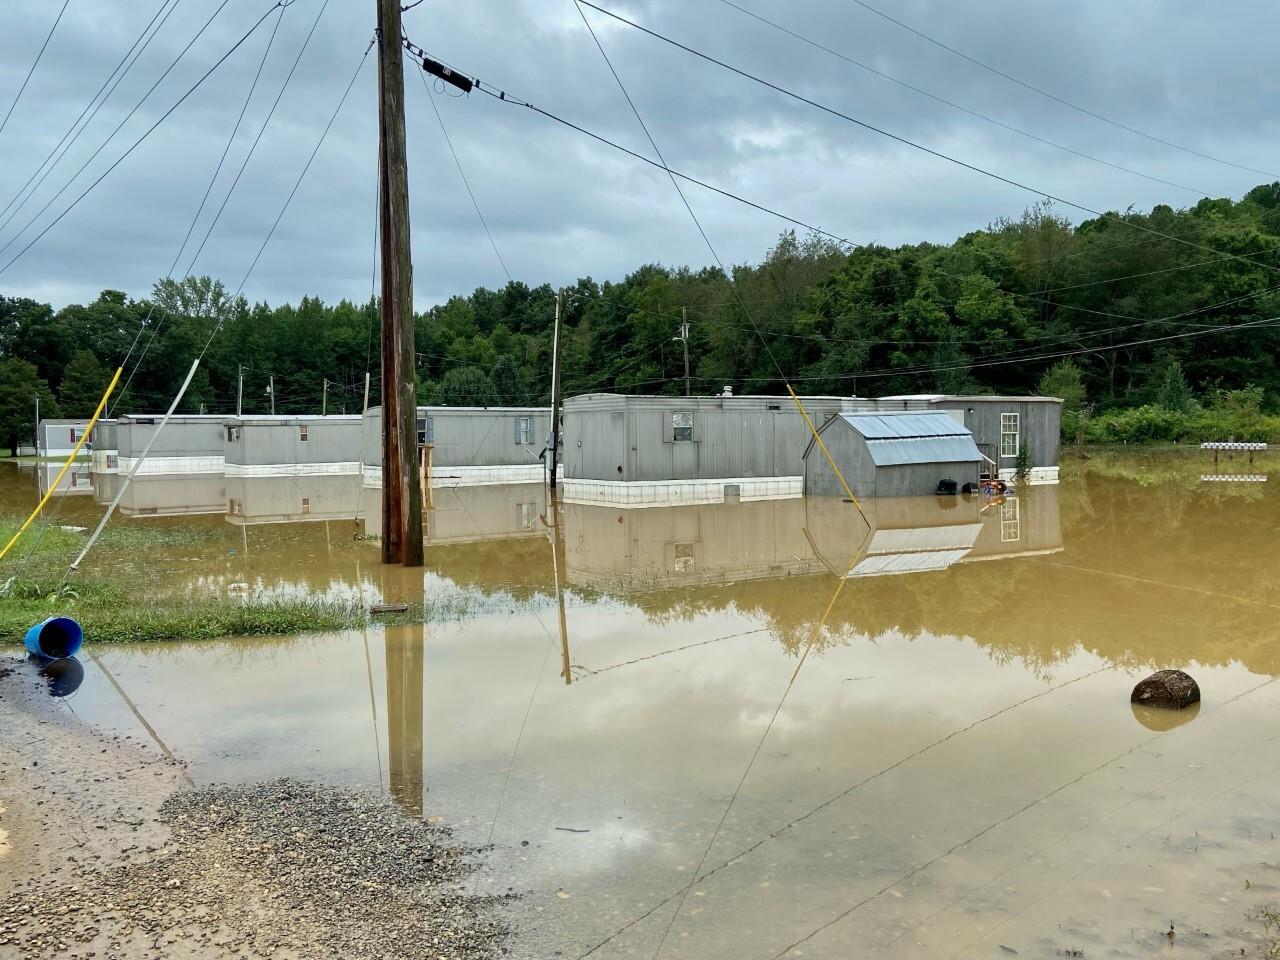 dickson flooding 8/21/21